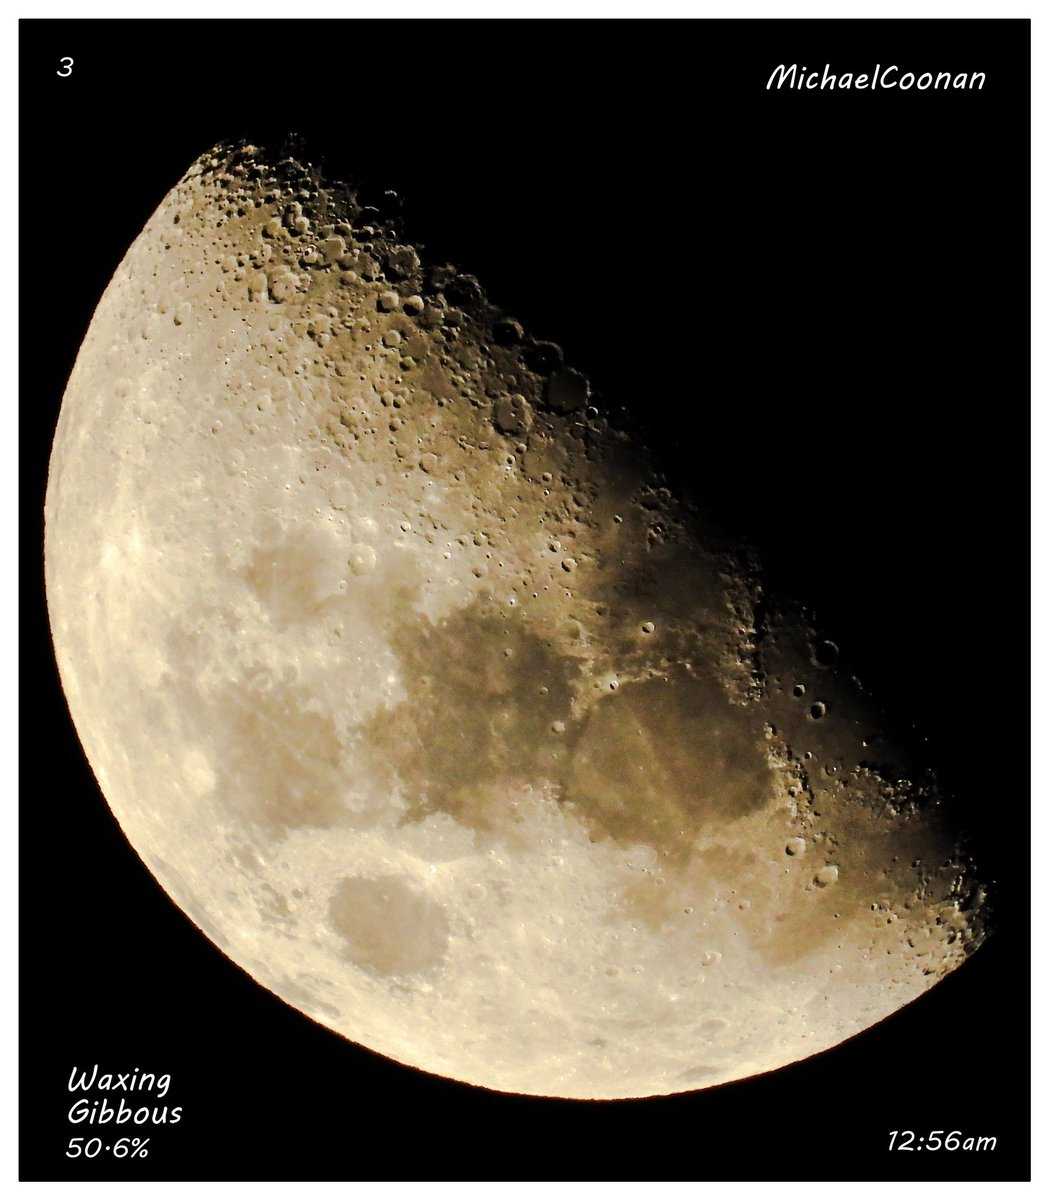 Sunday October 25th Waxing Gibbous Moon 60.6% in Wodonga Australia #StormHour #moon #luna #moonshot #Moon_awards #astrophotography #astronomy @CherScheff @KayMcCaffery1 @PicPublic @PicPoet #500pxrtg @ThePhotoHour @BonfirePictures @500pxrtg https://t.co/KBaVXKAm4m